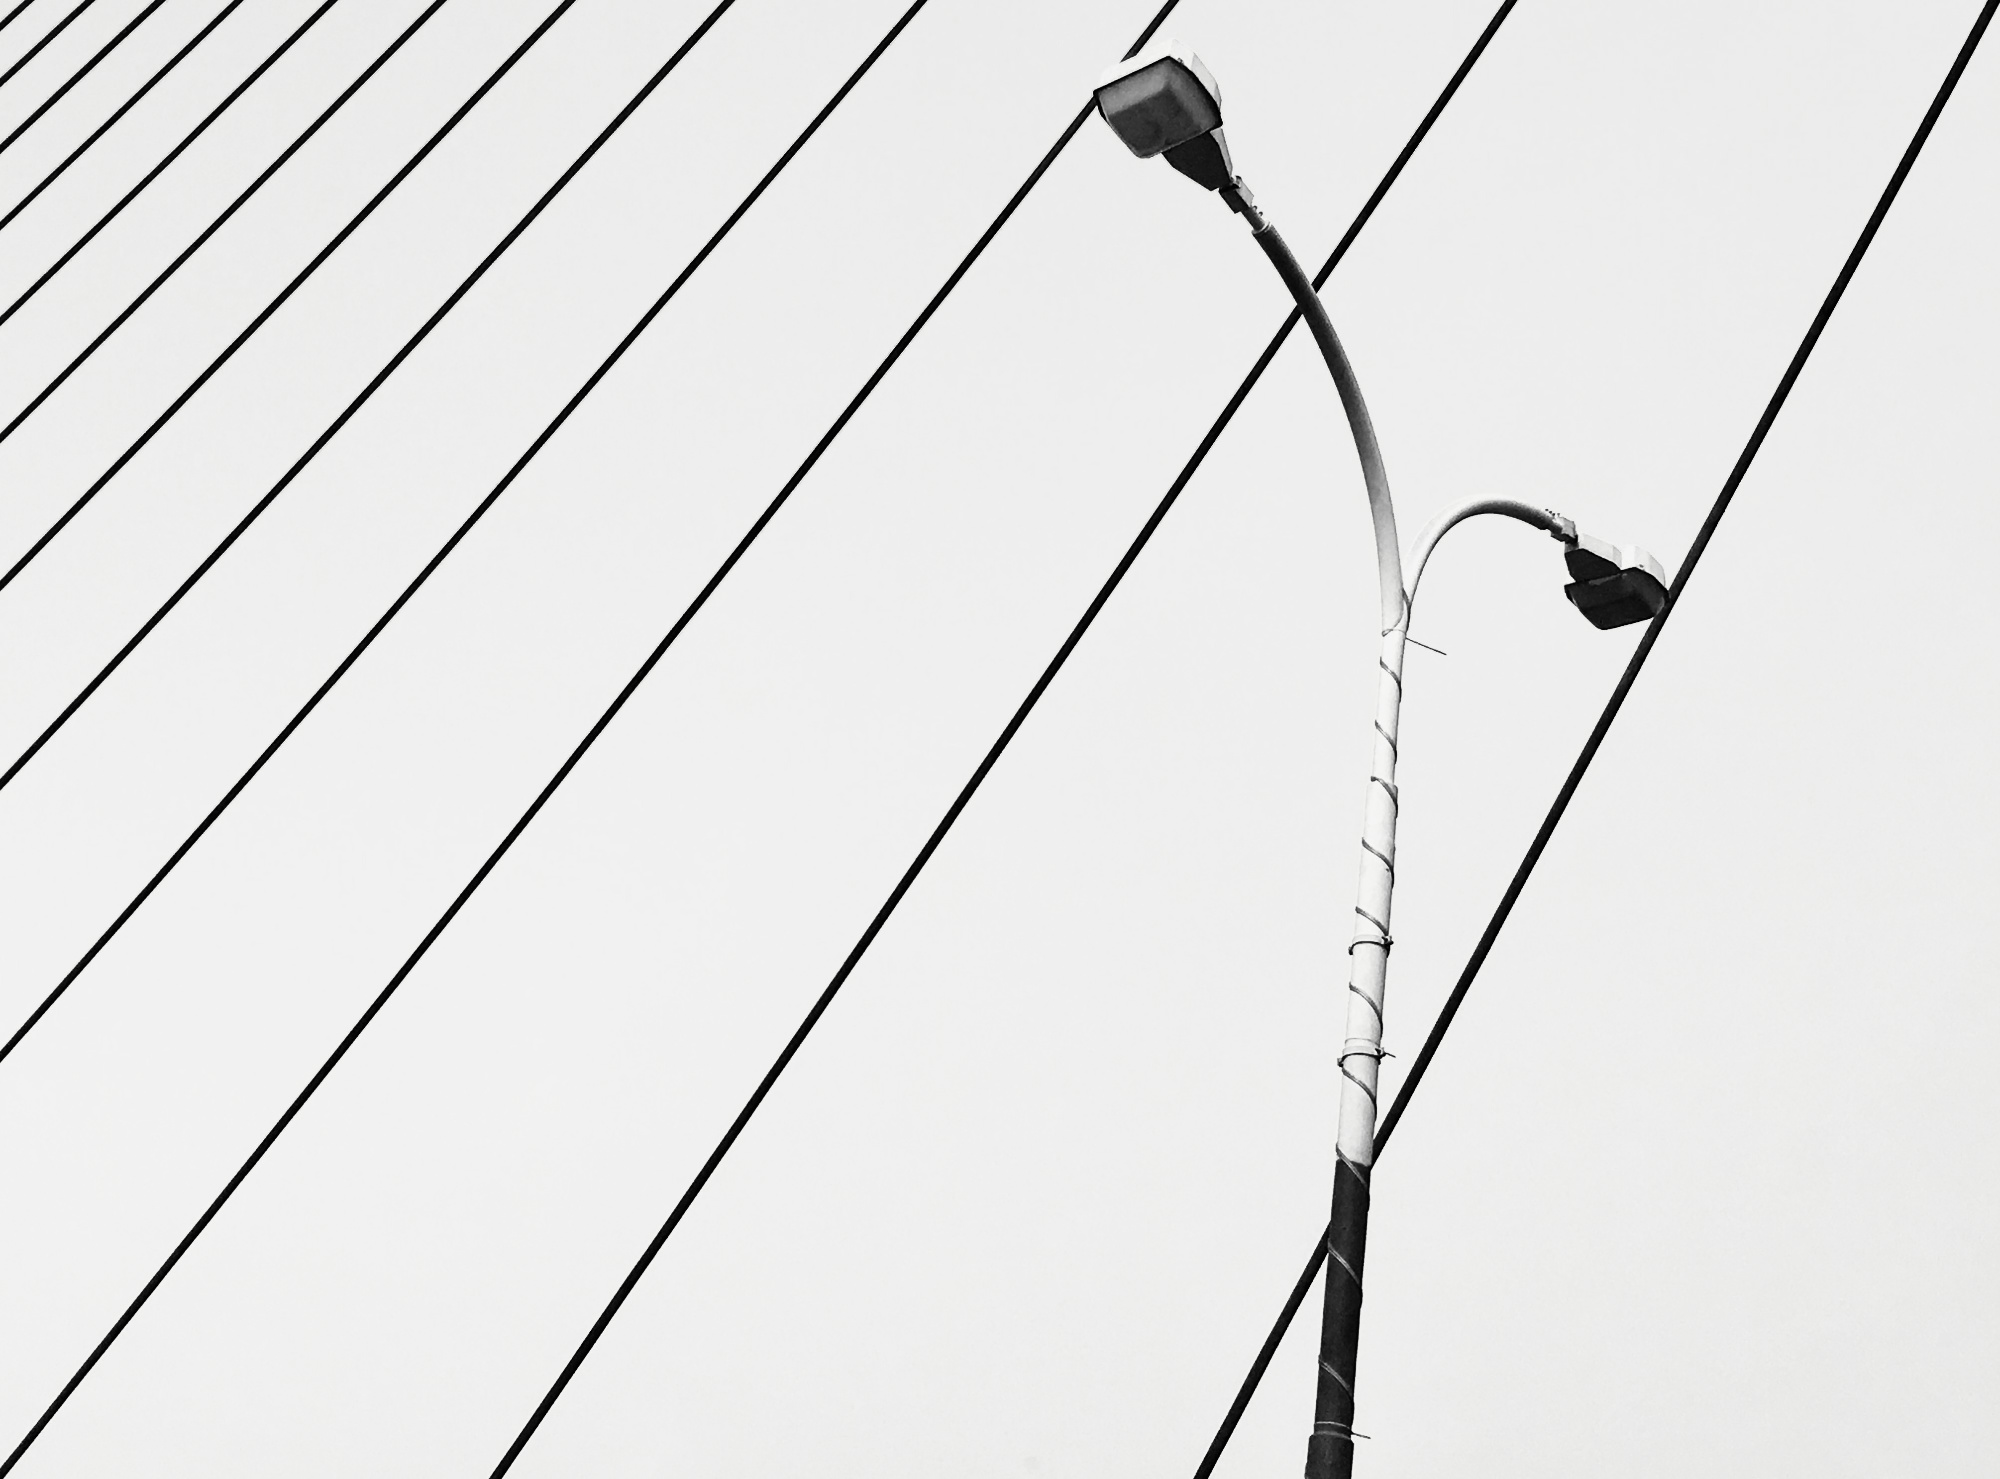 Suspension wires of a major bridge in Kolkata.